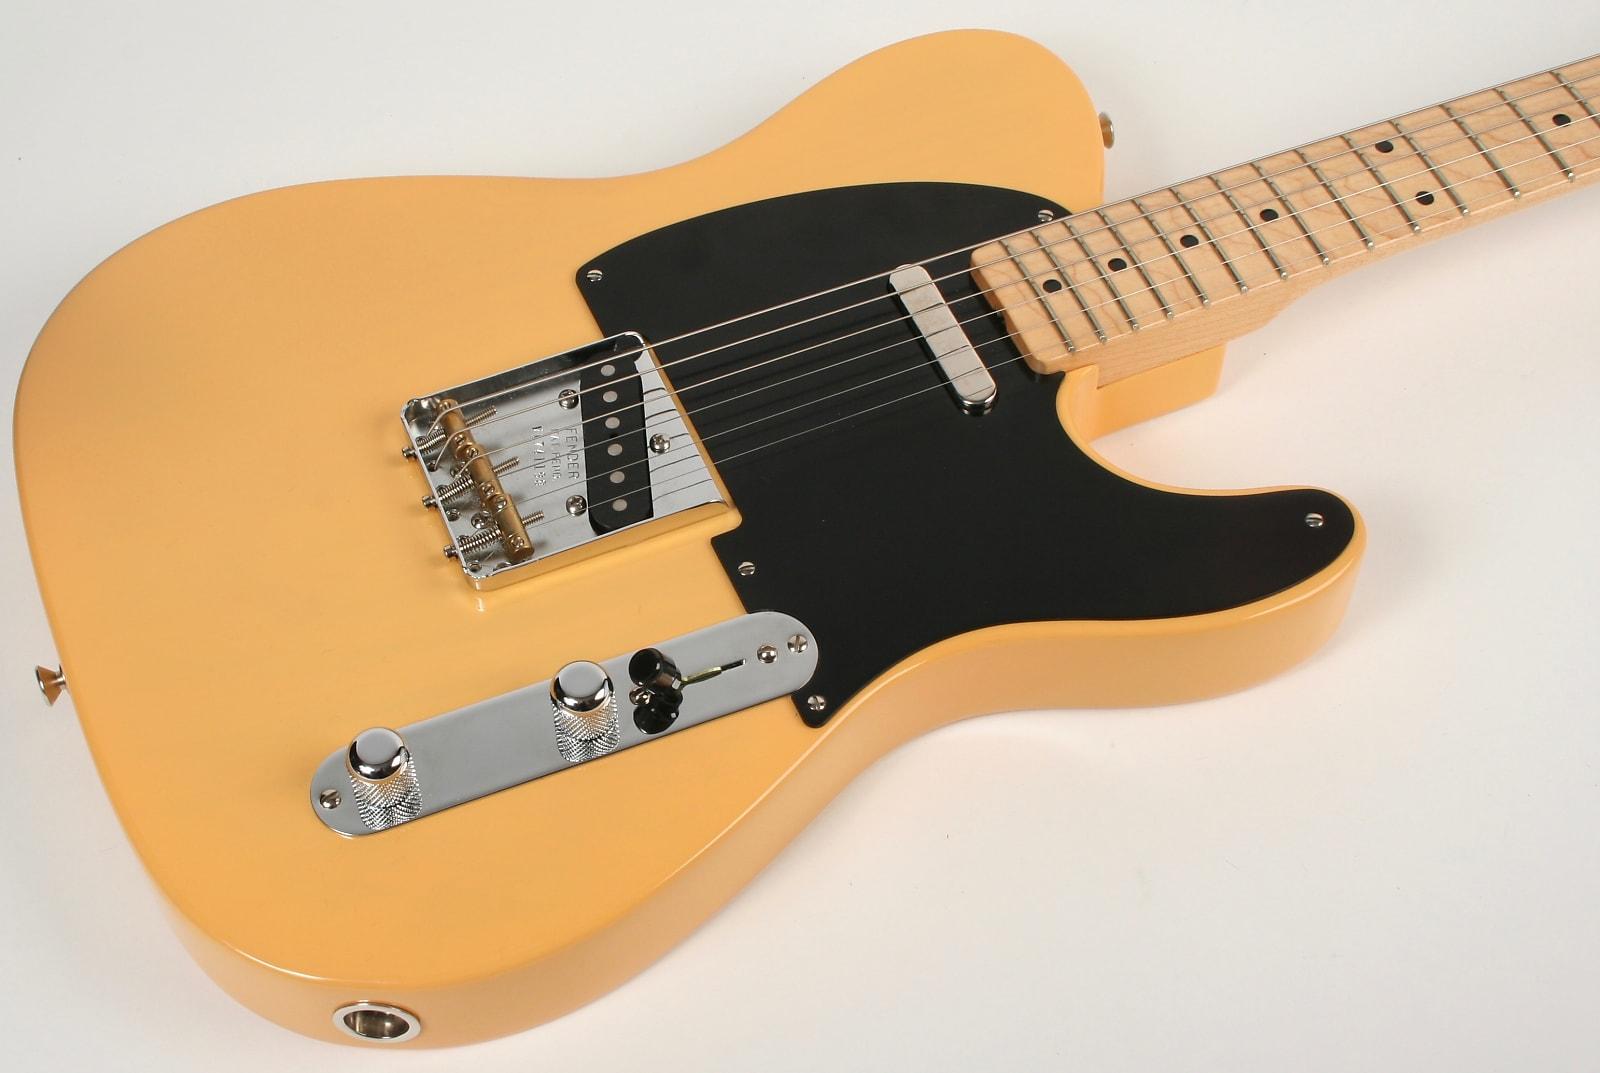 Fender '52 Reissue Telecaster Butterscotch Blonde Thin Skin Lollar Pickups